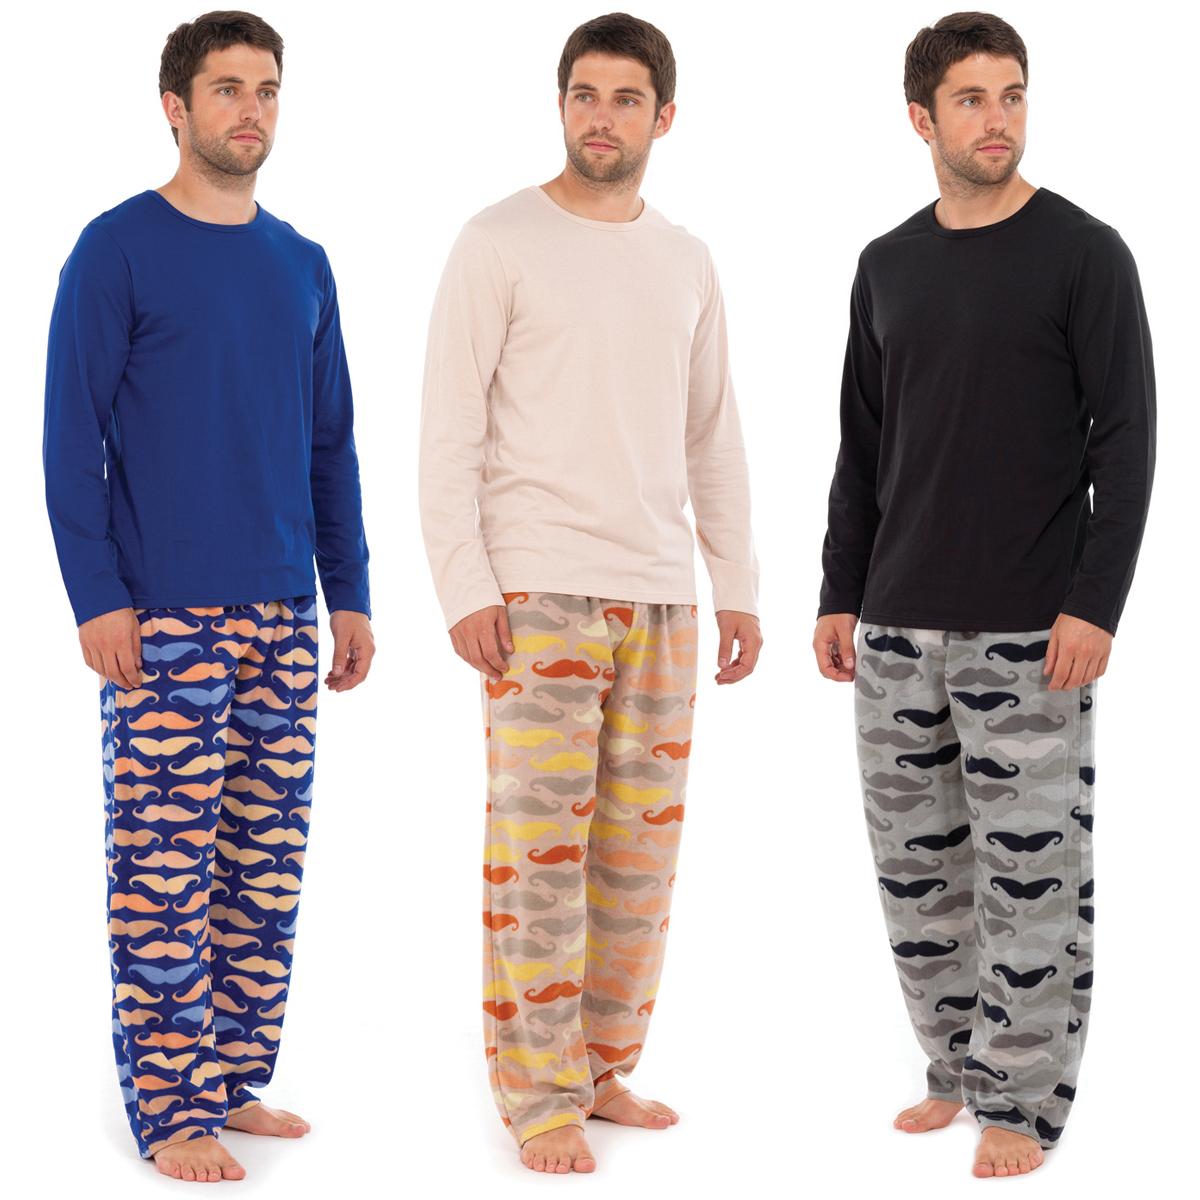 Mens Moustache PJ Print Fleece Pyjamas Sets Night Wear PJ\'s 2 Piece ...